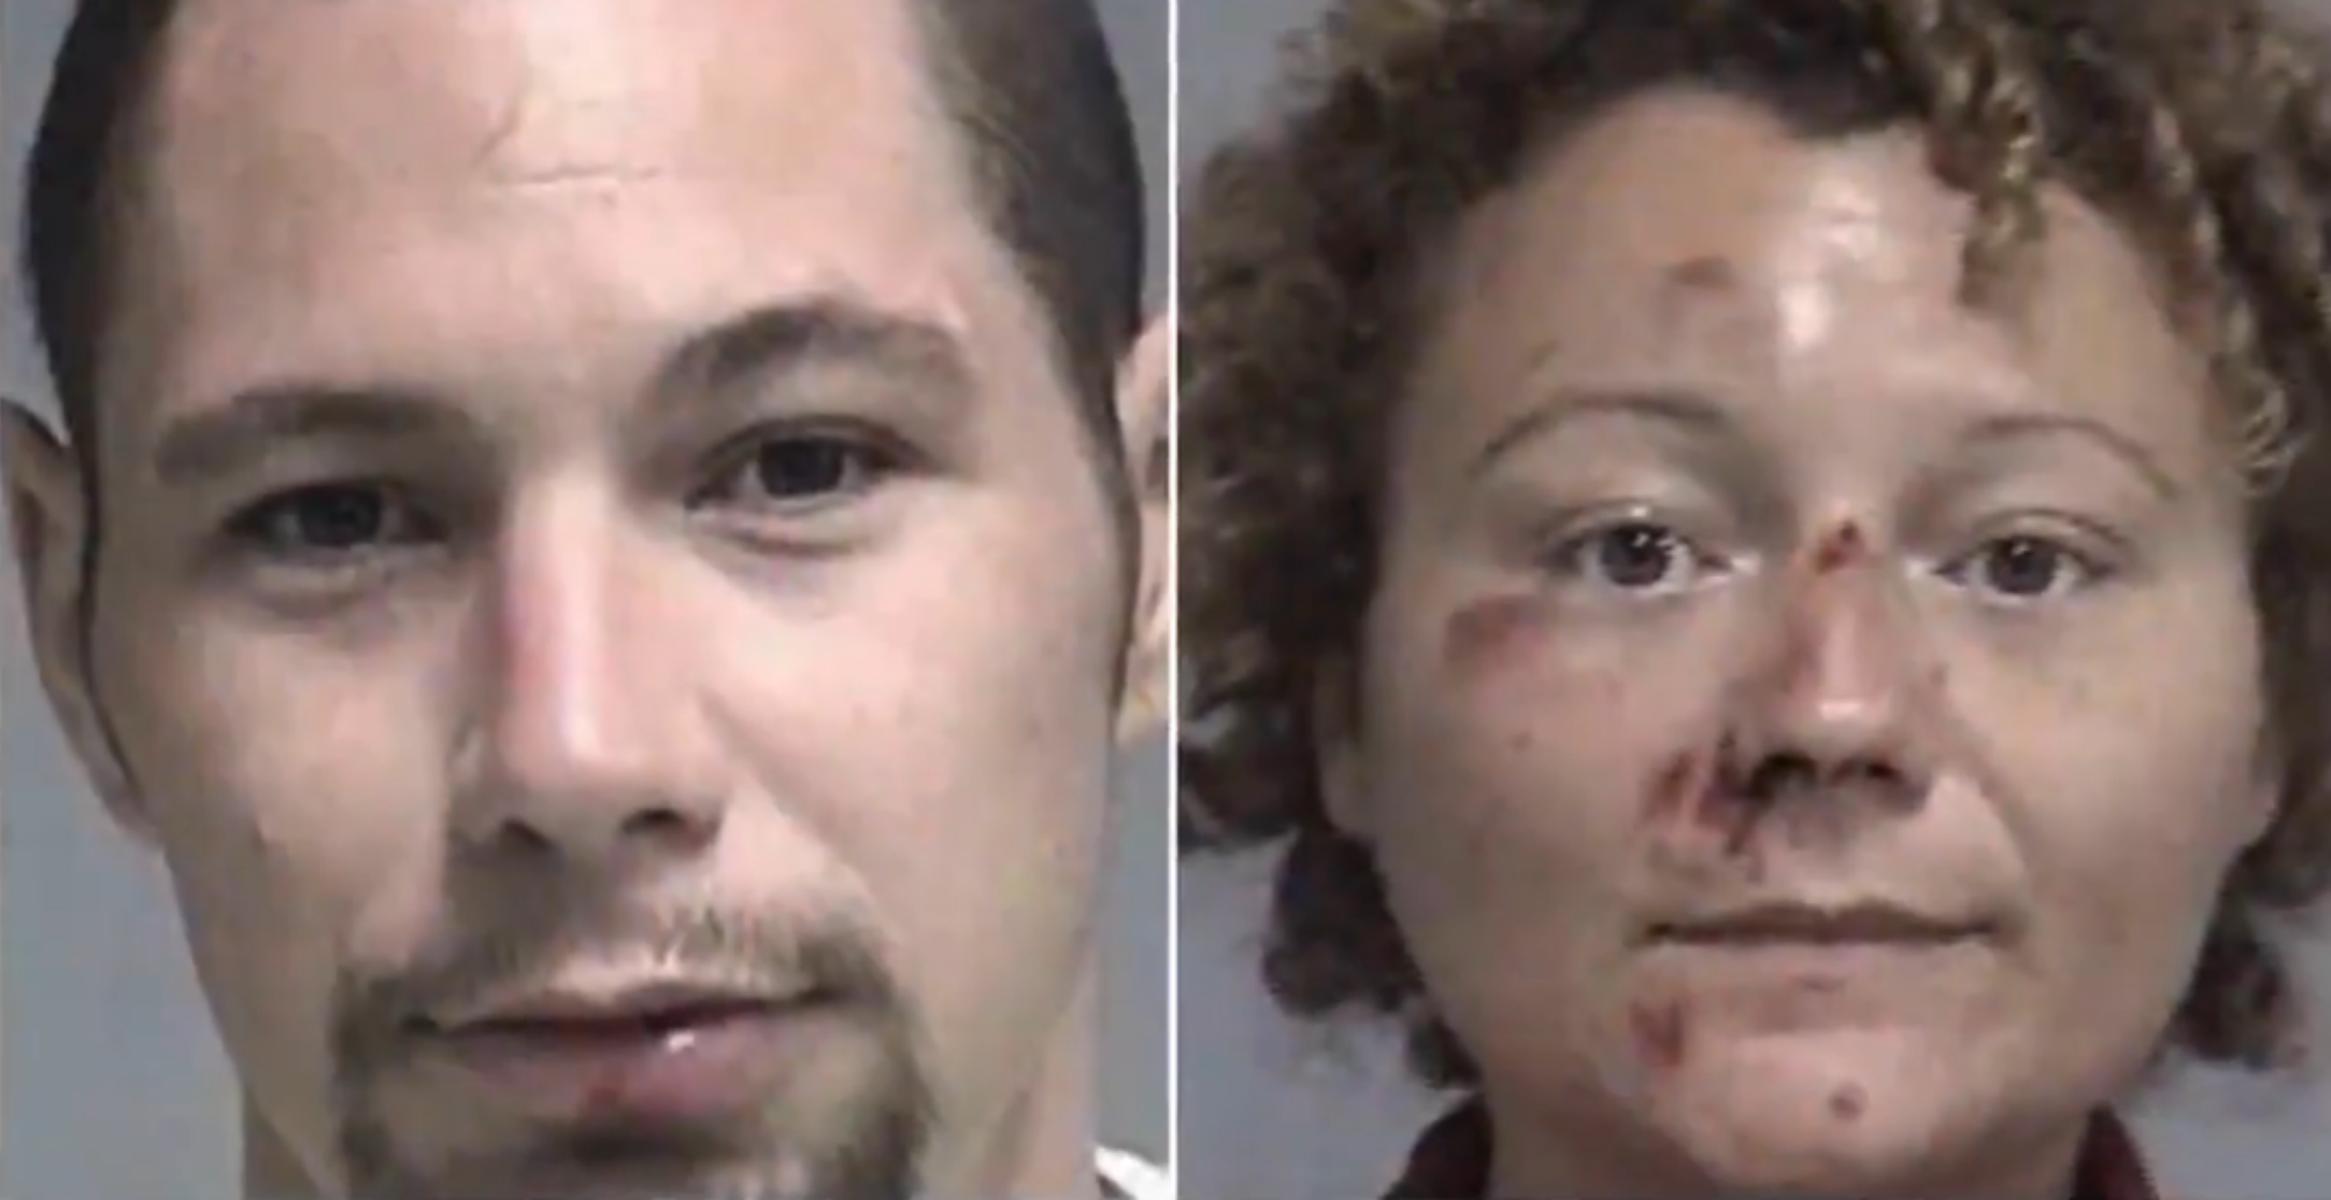 Florida Couple Have Sex in Patrol Car Amid DUI Arrest